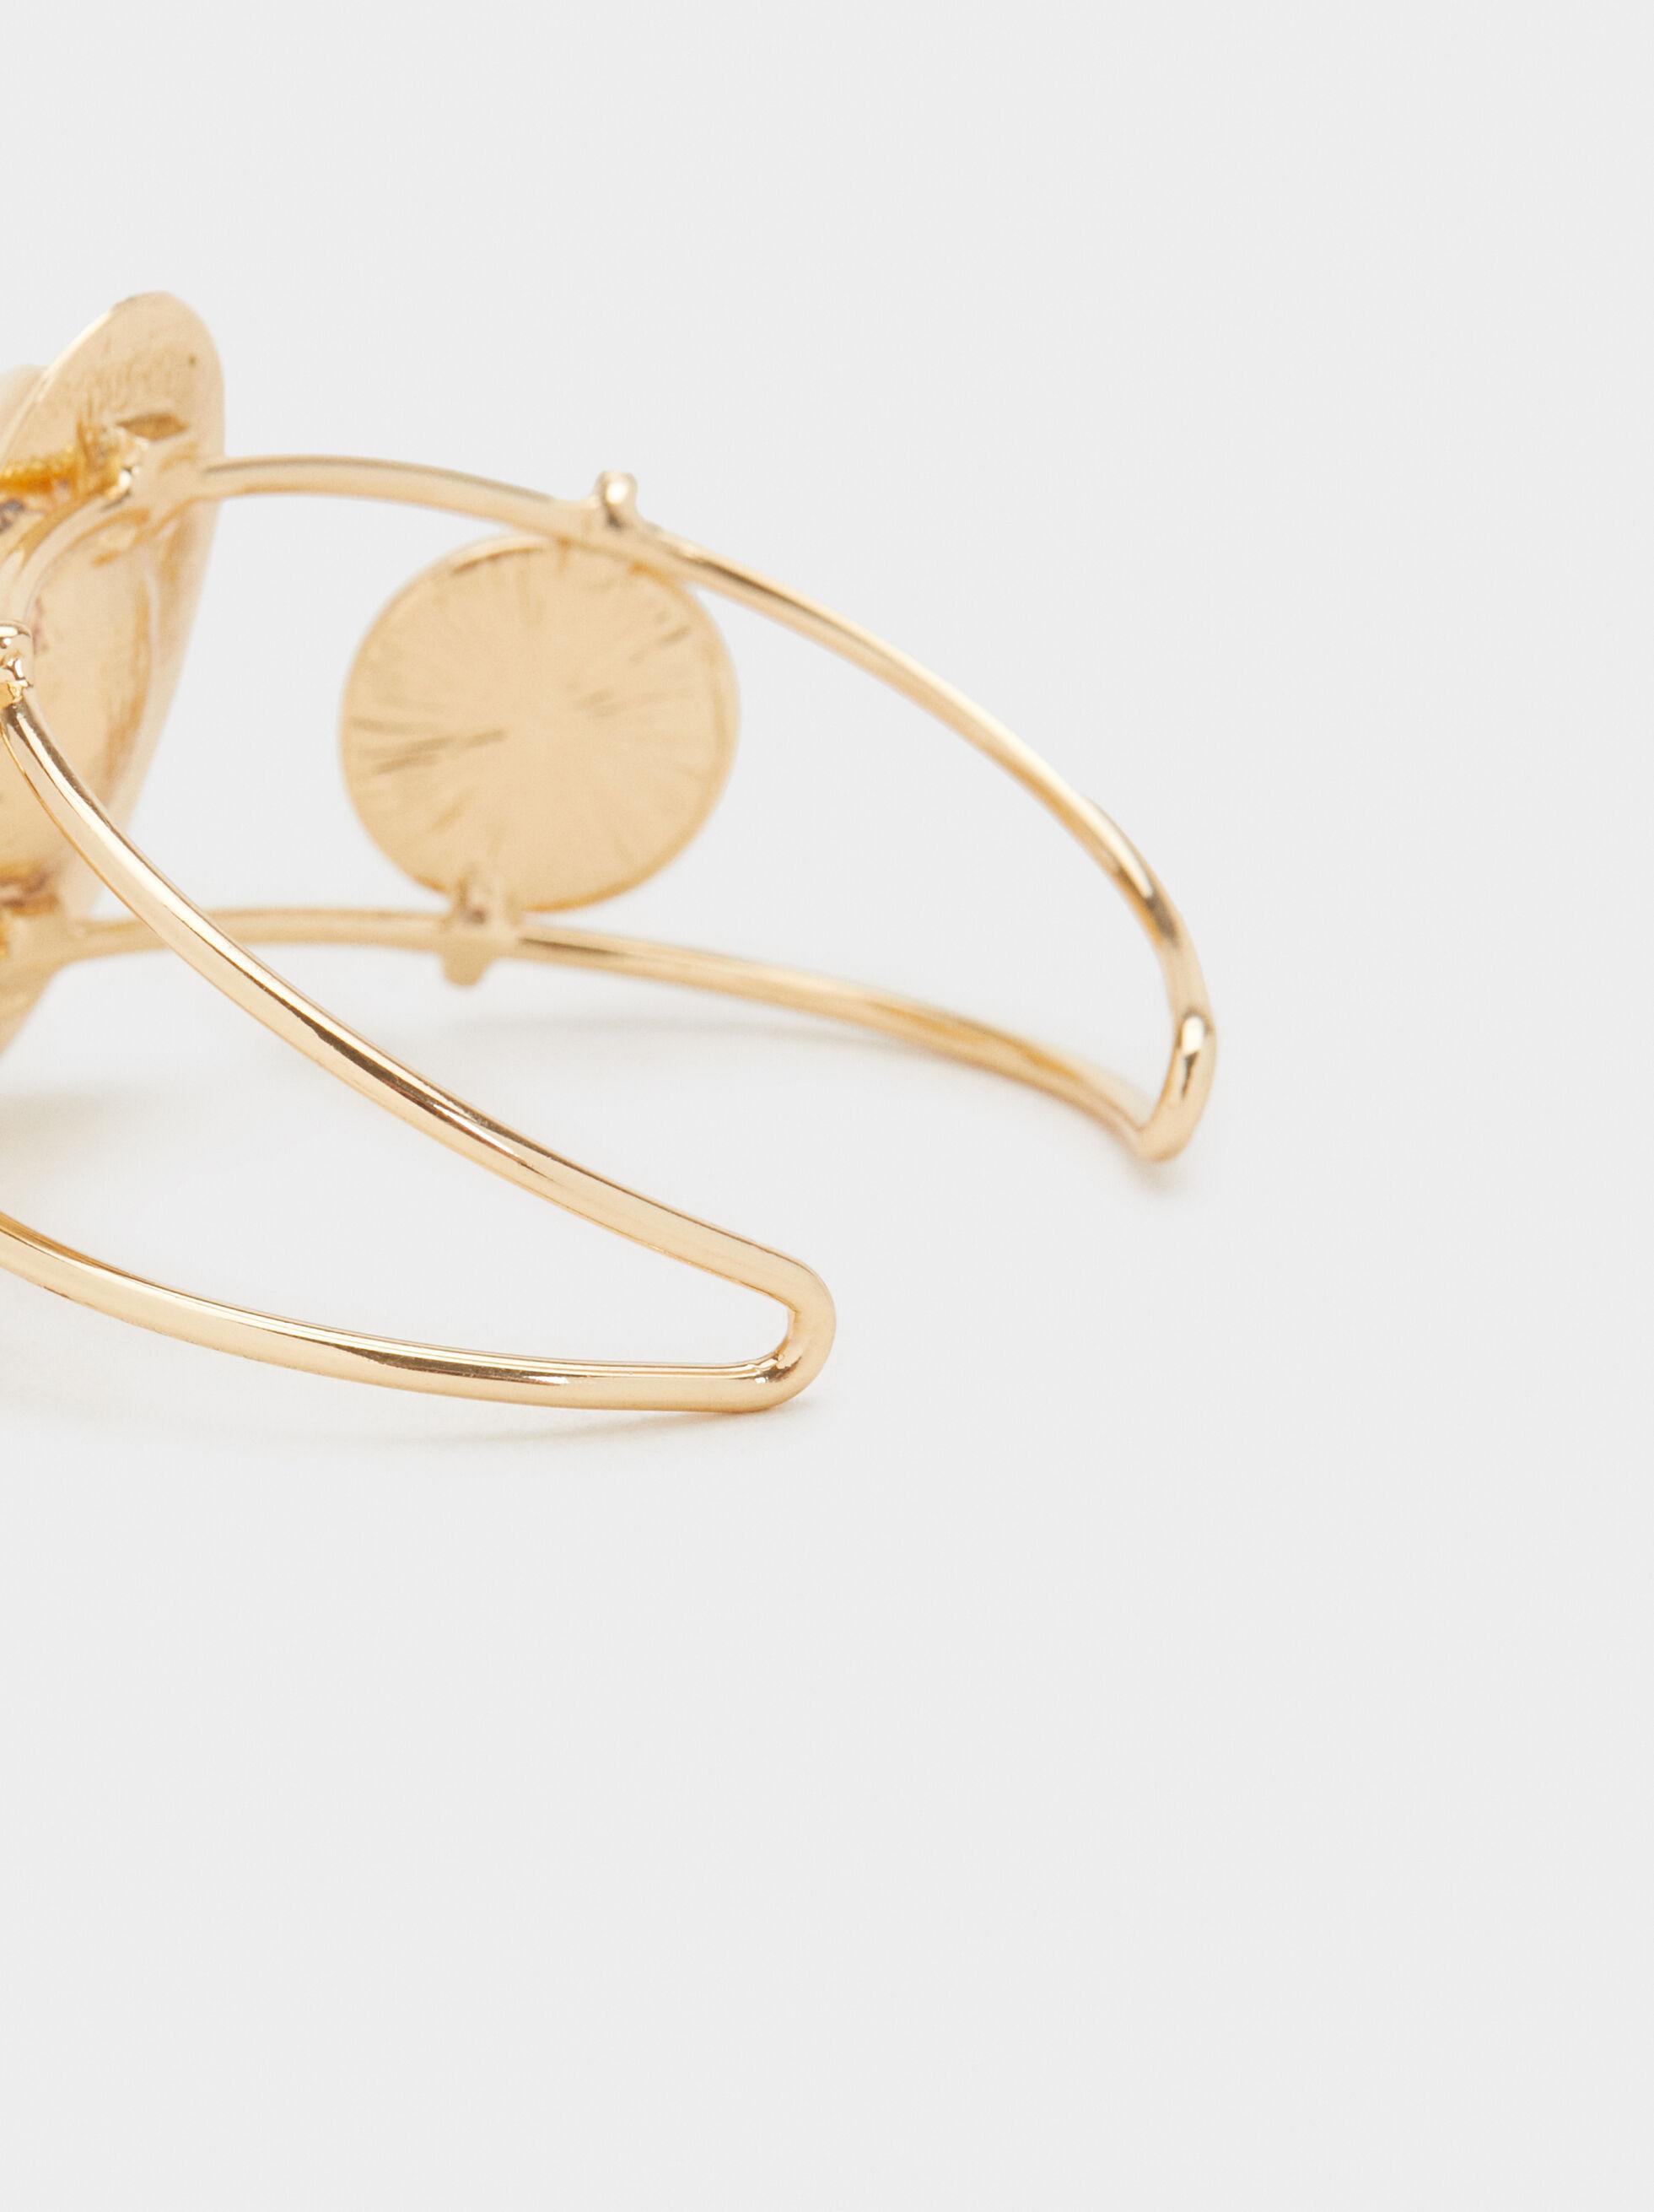 Rigid Seashell Bracelet, Golden, hi-res